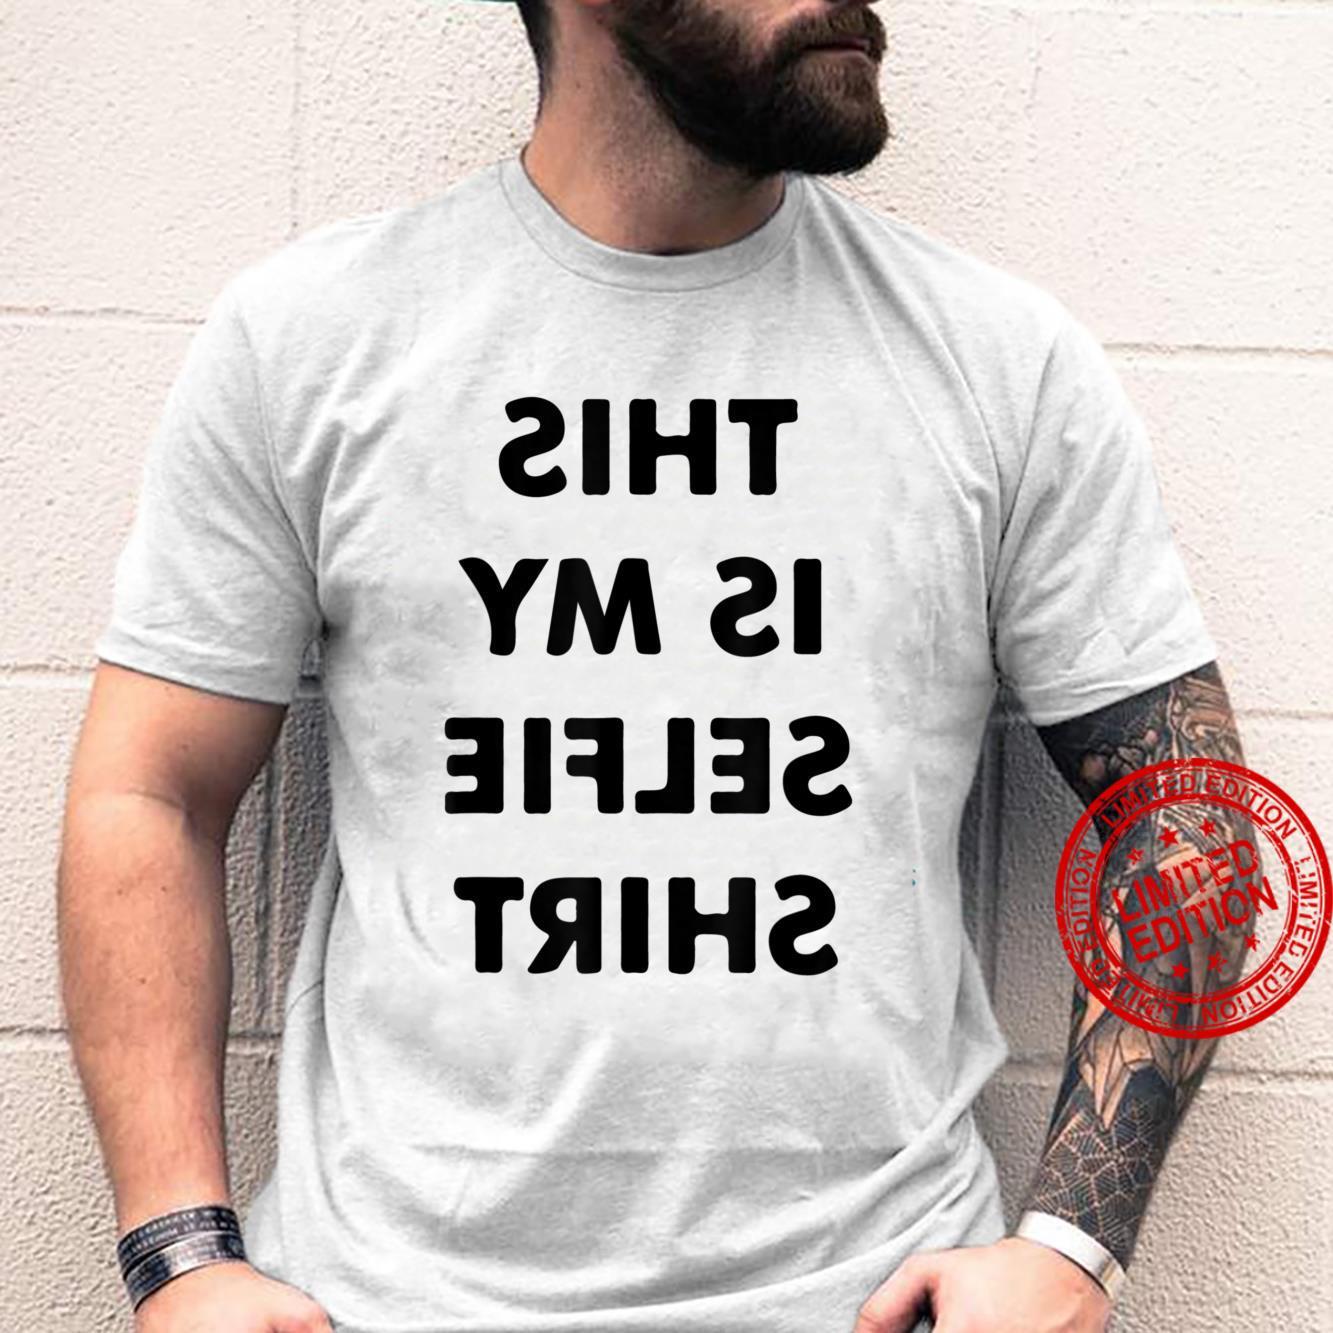 This is My SelfieTshirt Shirt